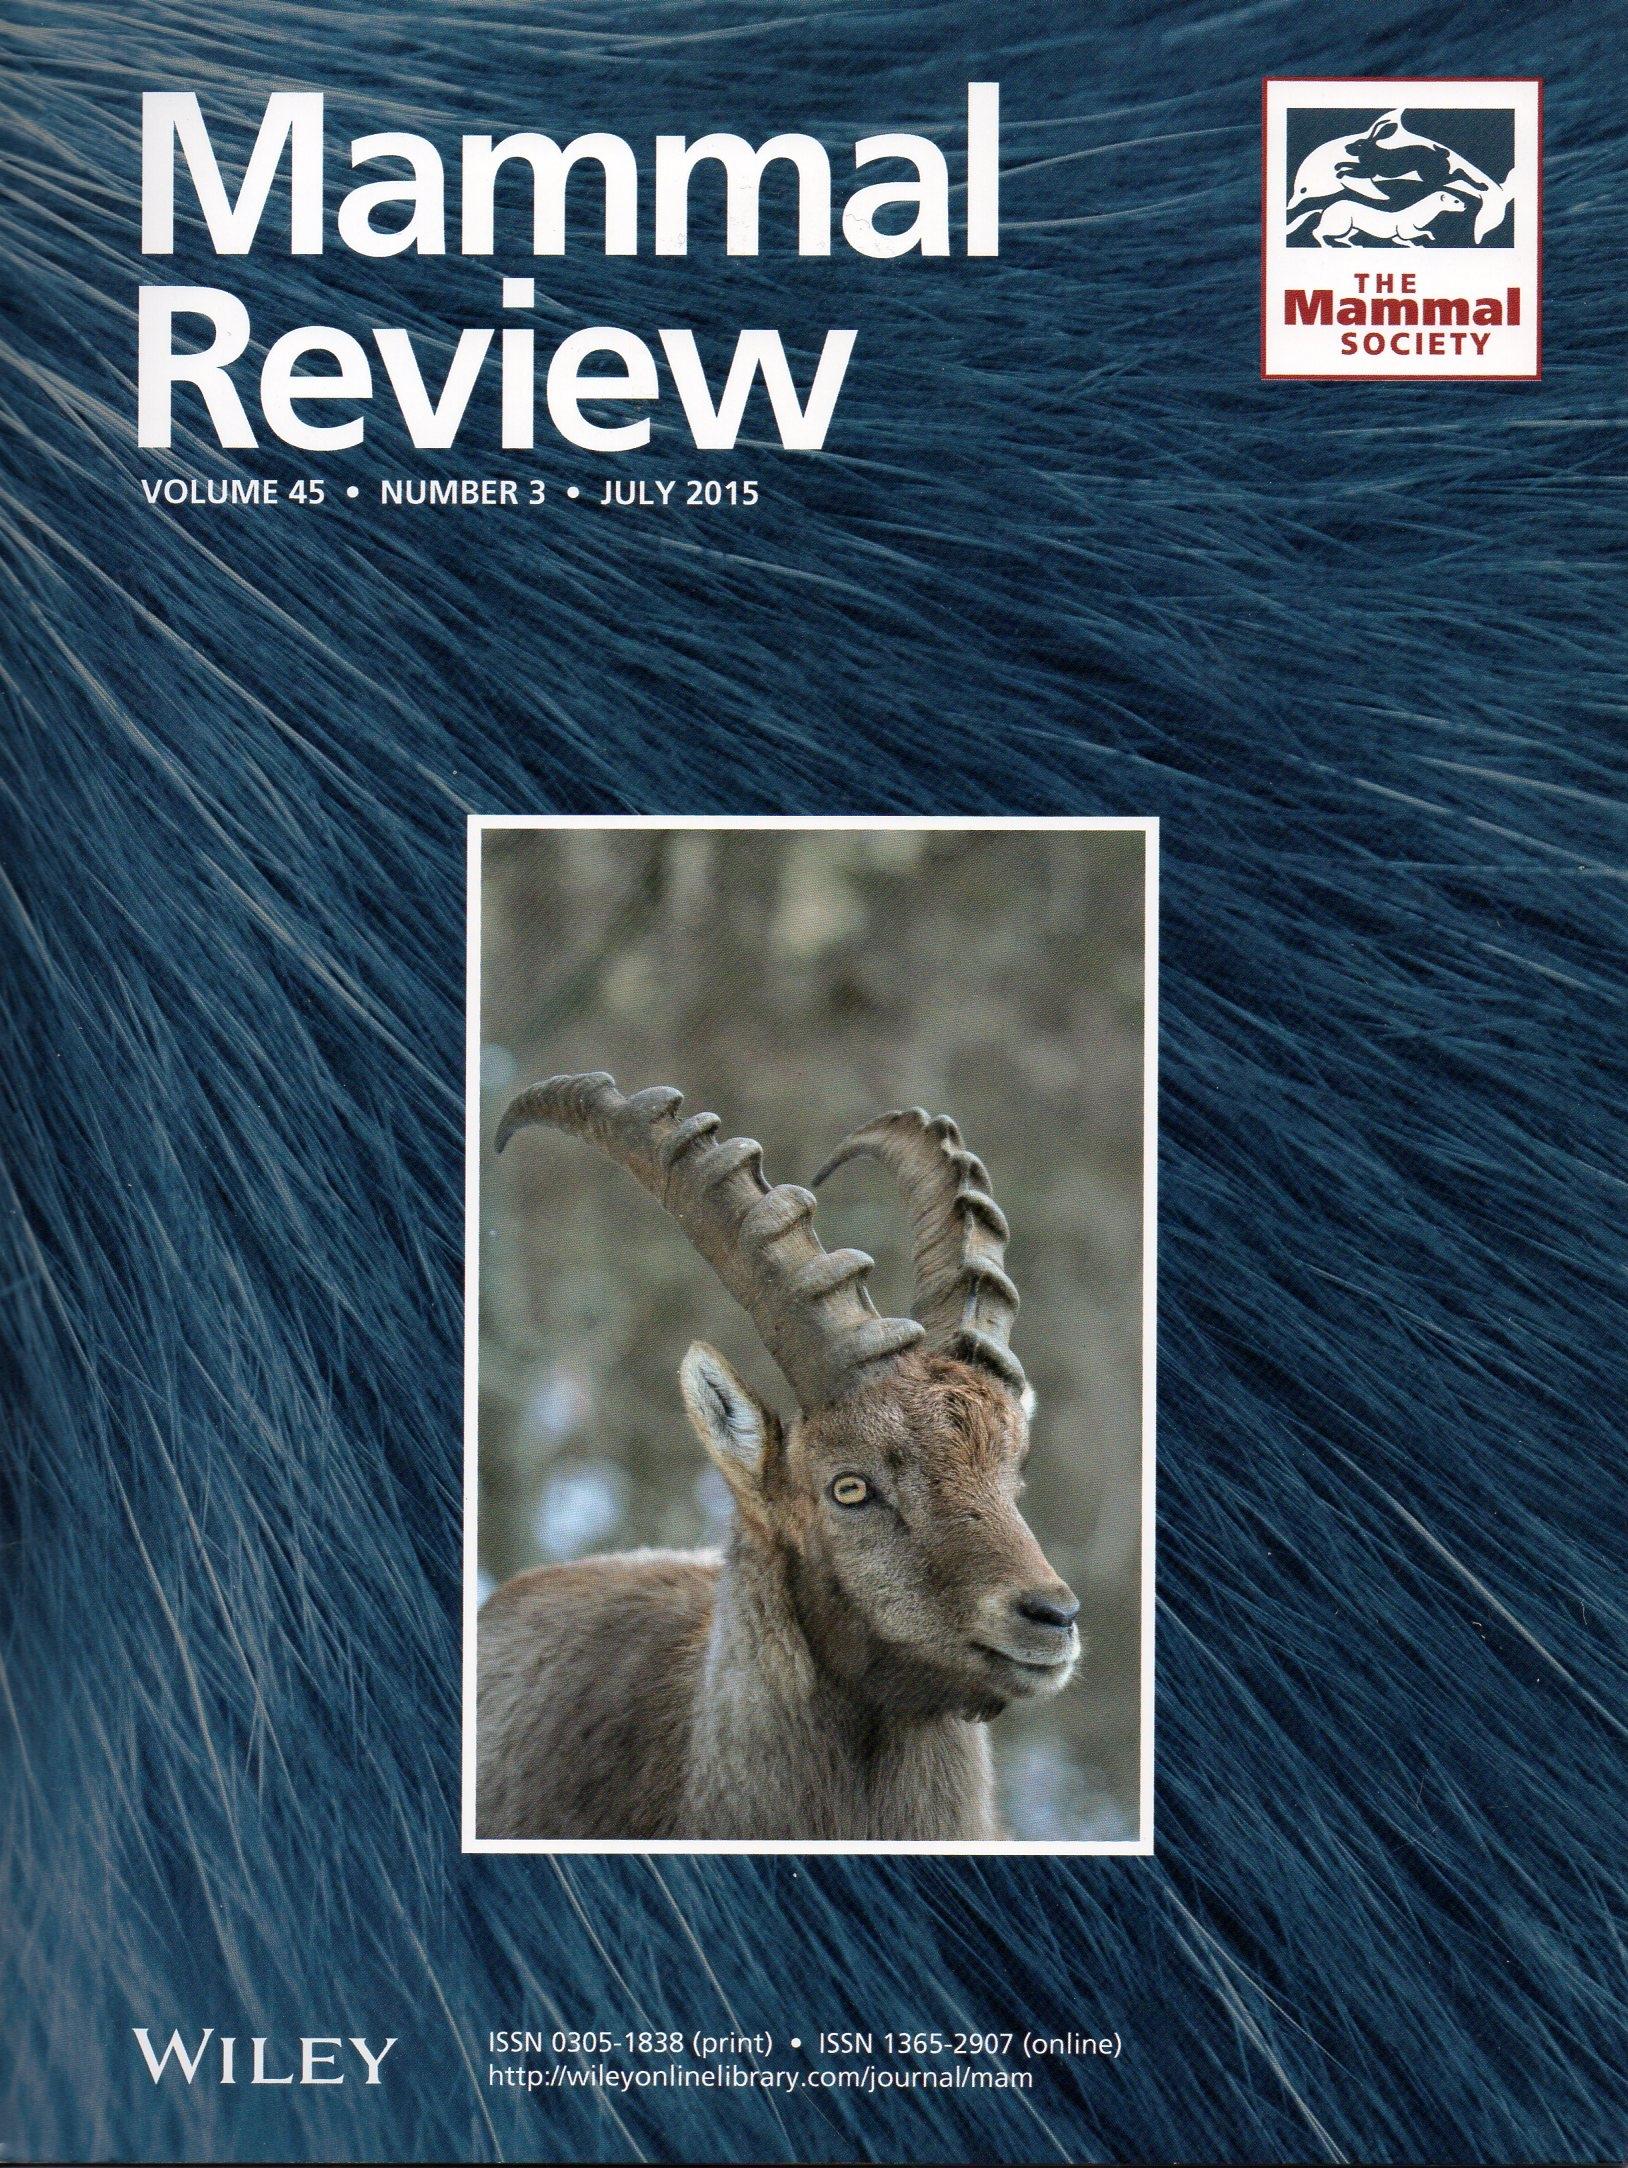 mammal_review.jpg